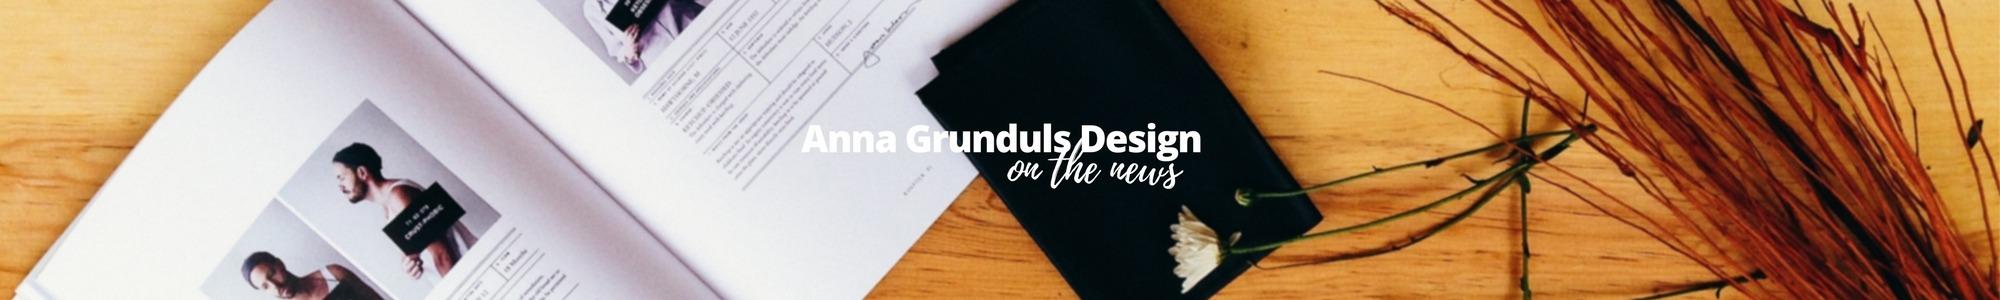 Anna Grunduls Design press releases